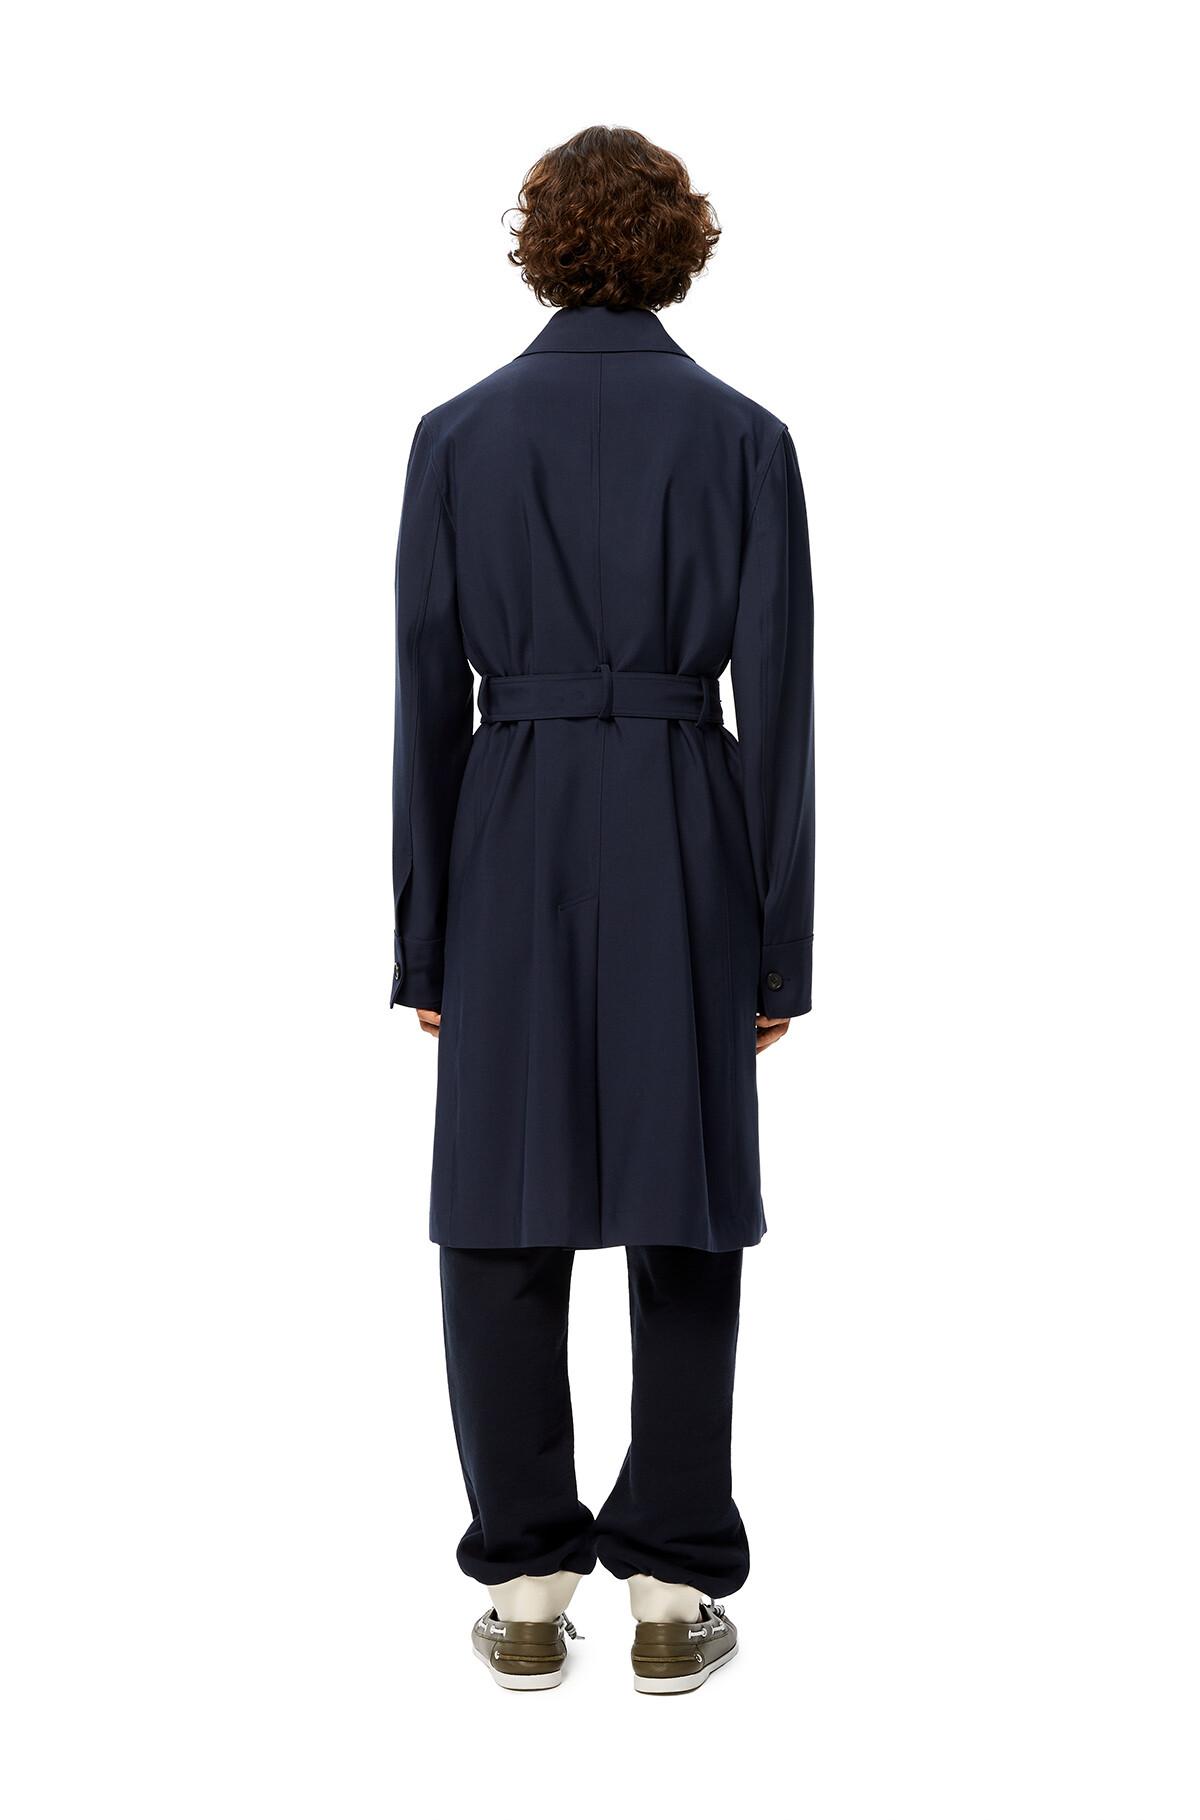 LOEWE Belted Coat Navy Blue front